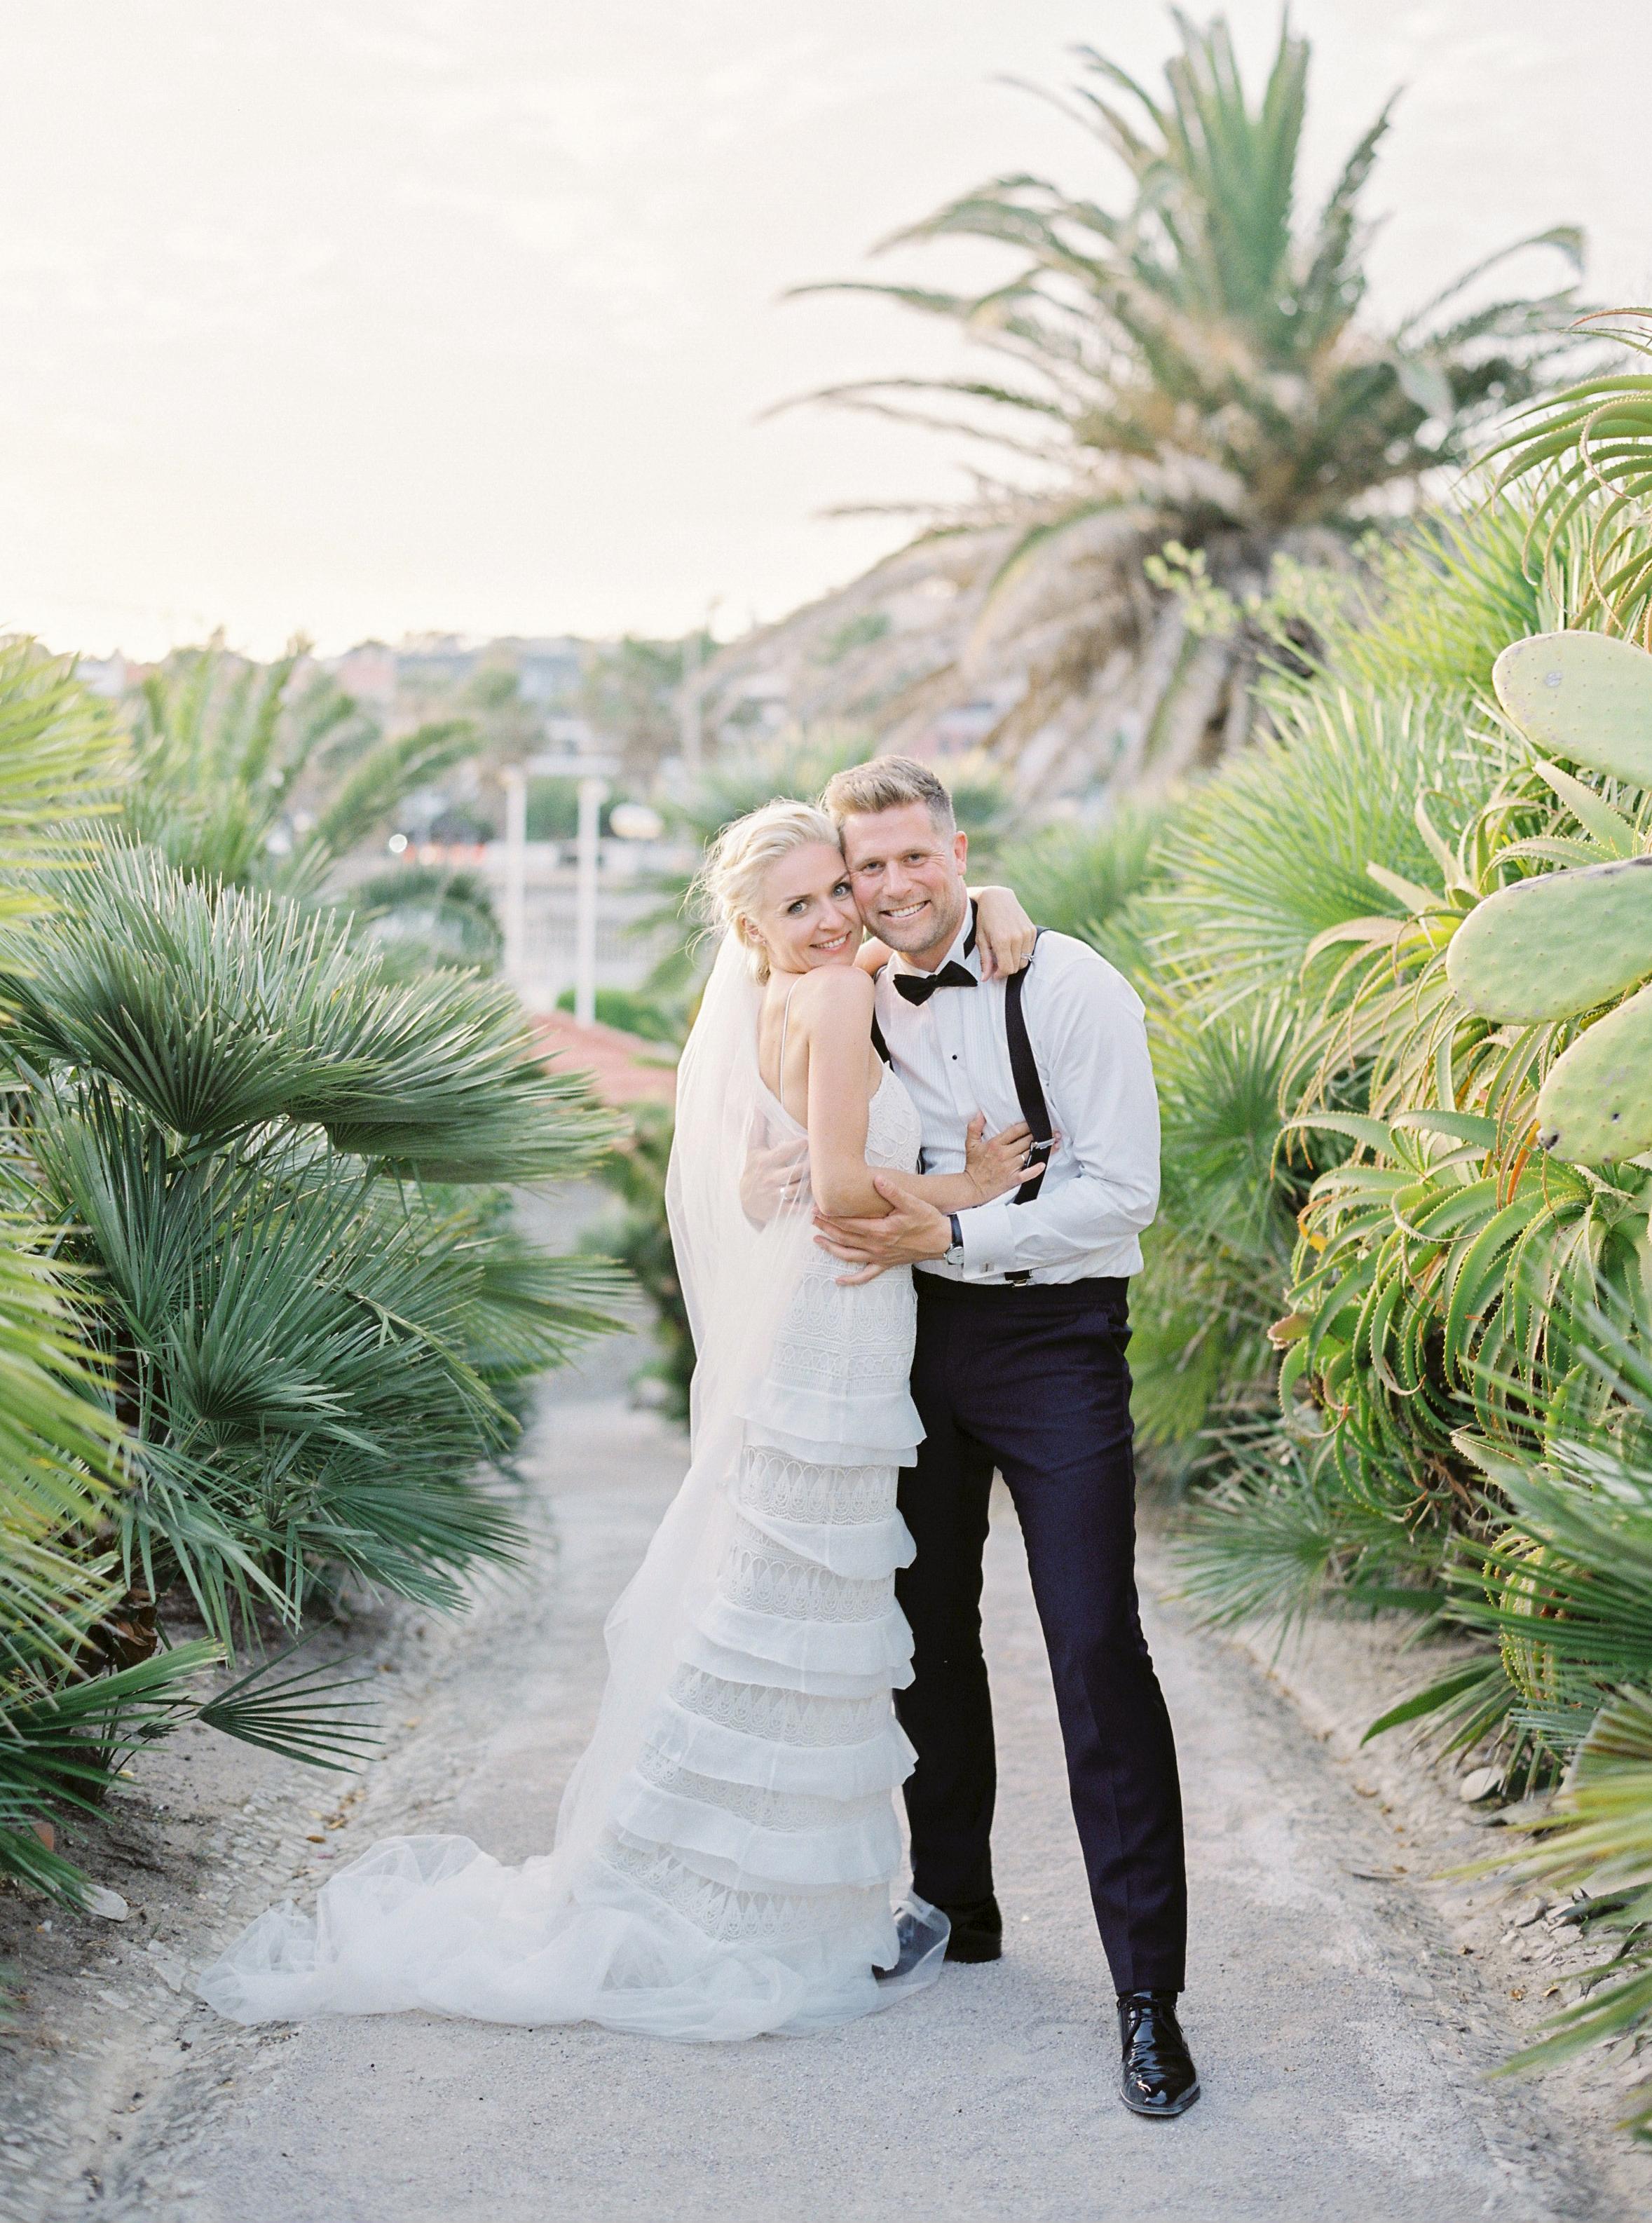 Nastia_Vesna_Photography_Wedding_Portugal_49.jpg